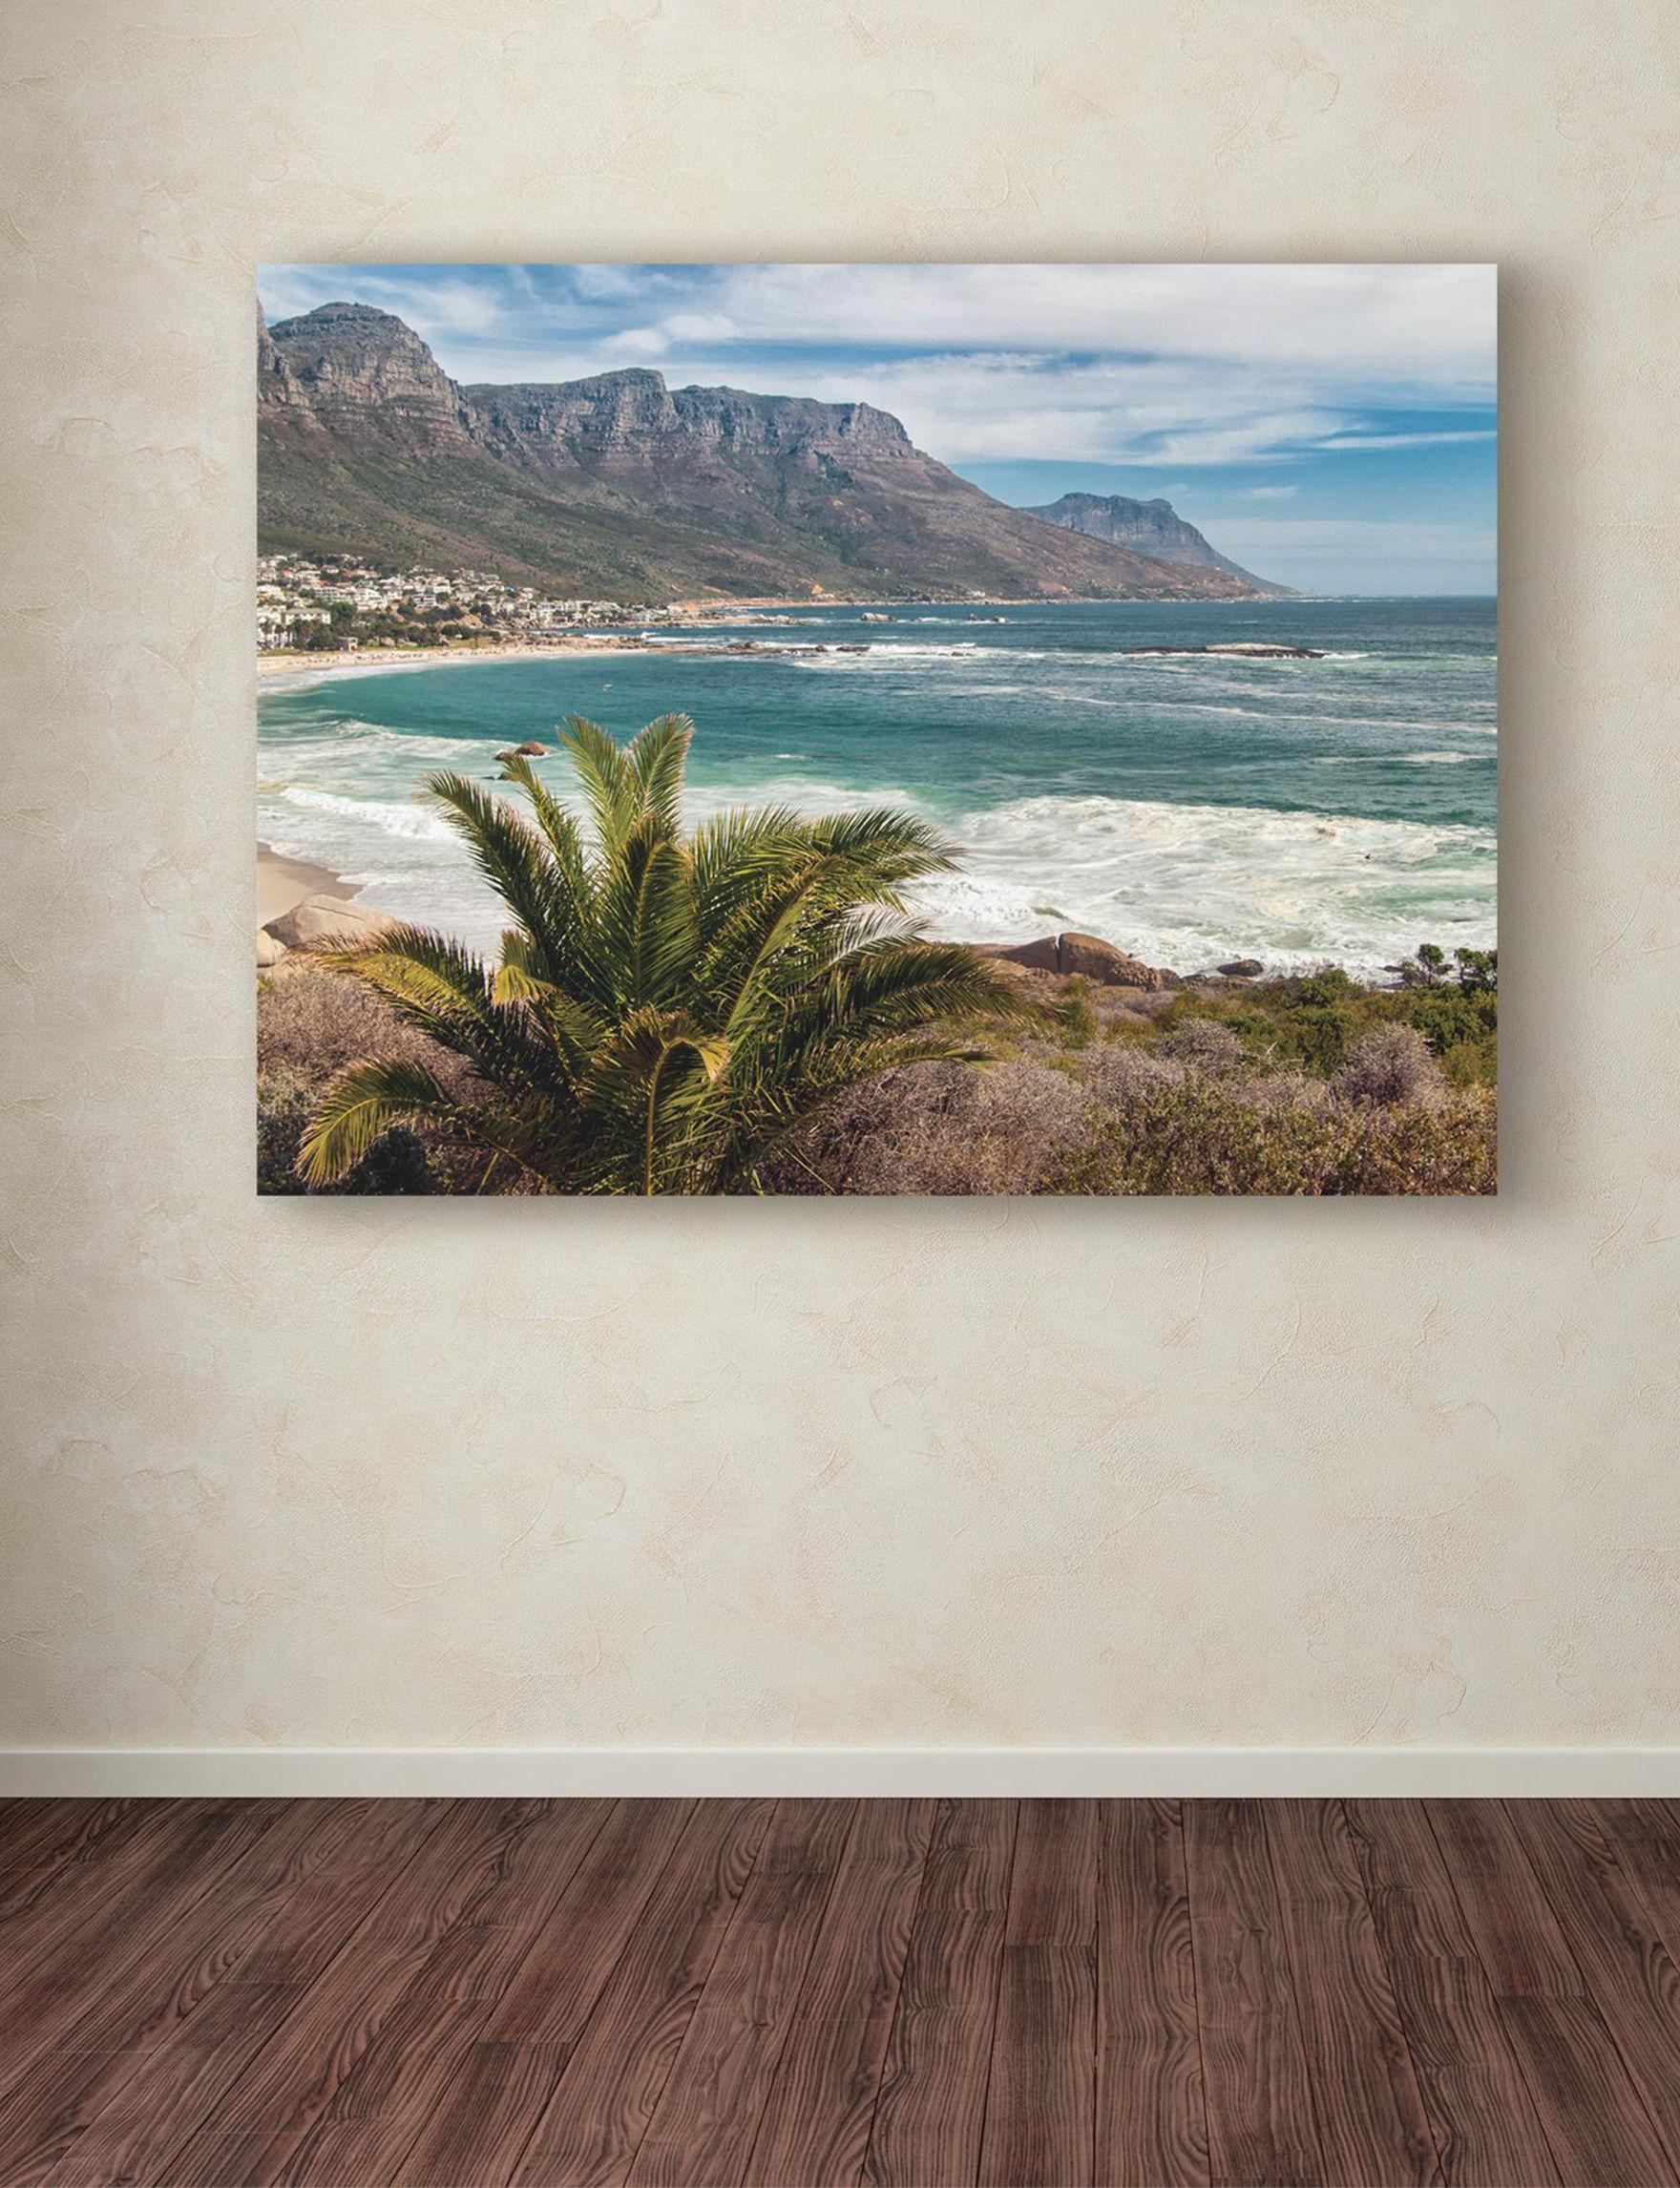 Trademark Fine Art  Wall Art Home Accents Wall Decor